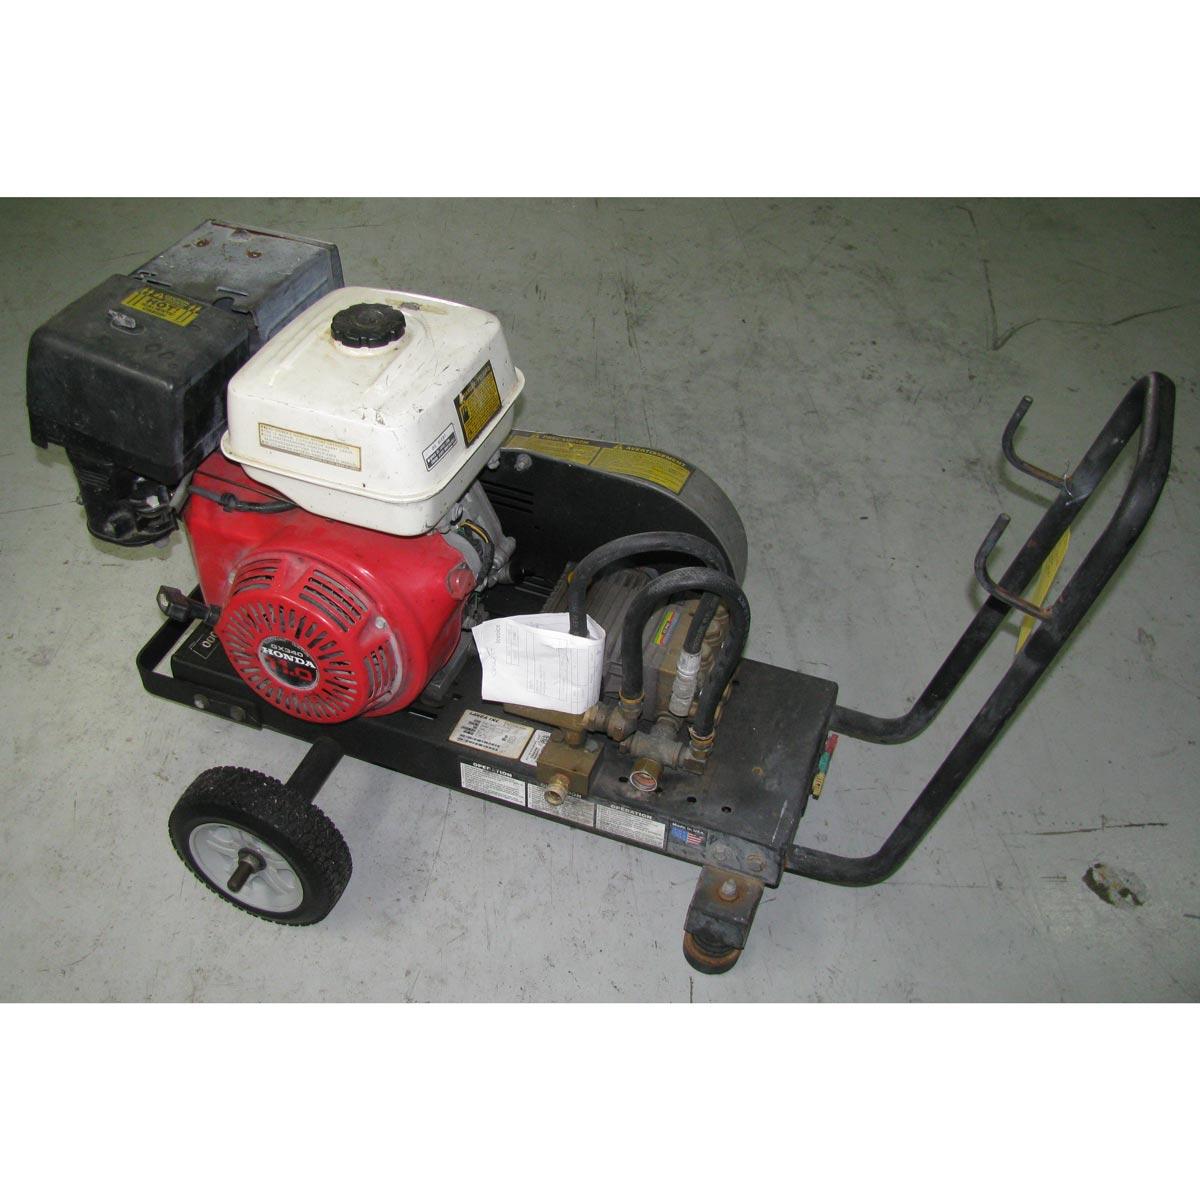 Used Karcher Landa Pgs4-30321 Cold Pressure Washer Honda 11 ... on